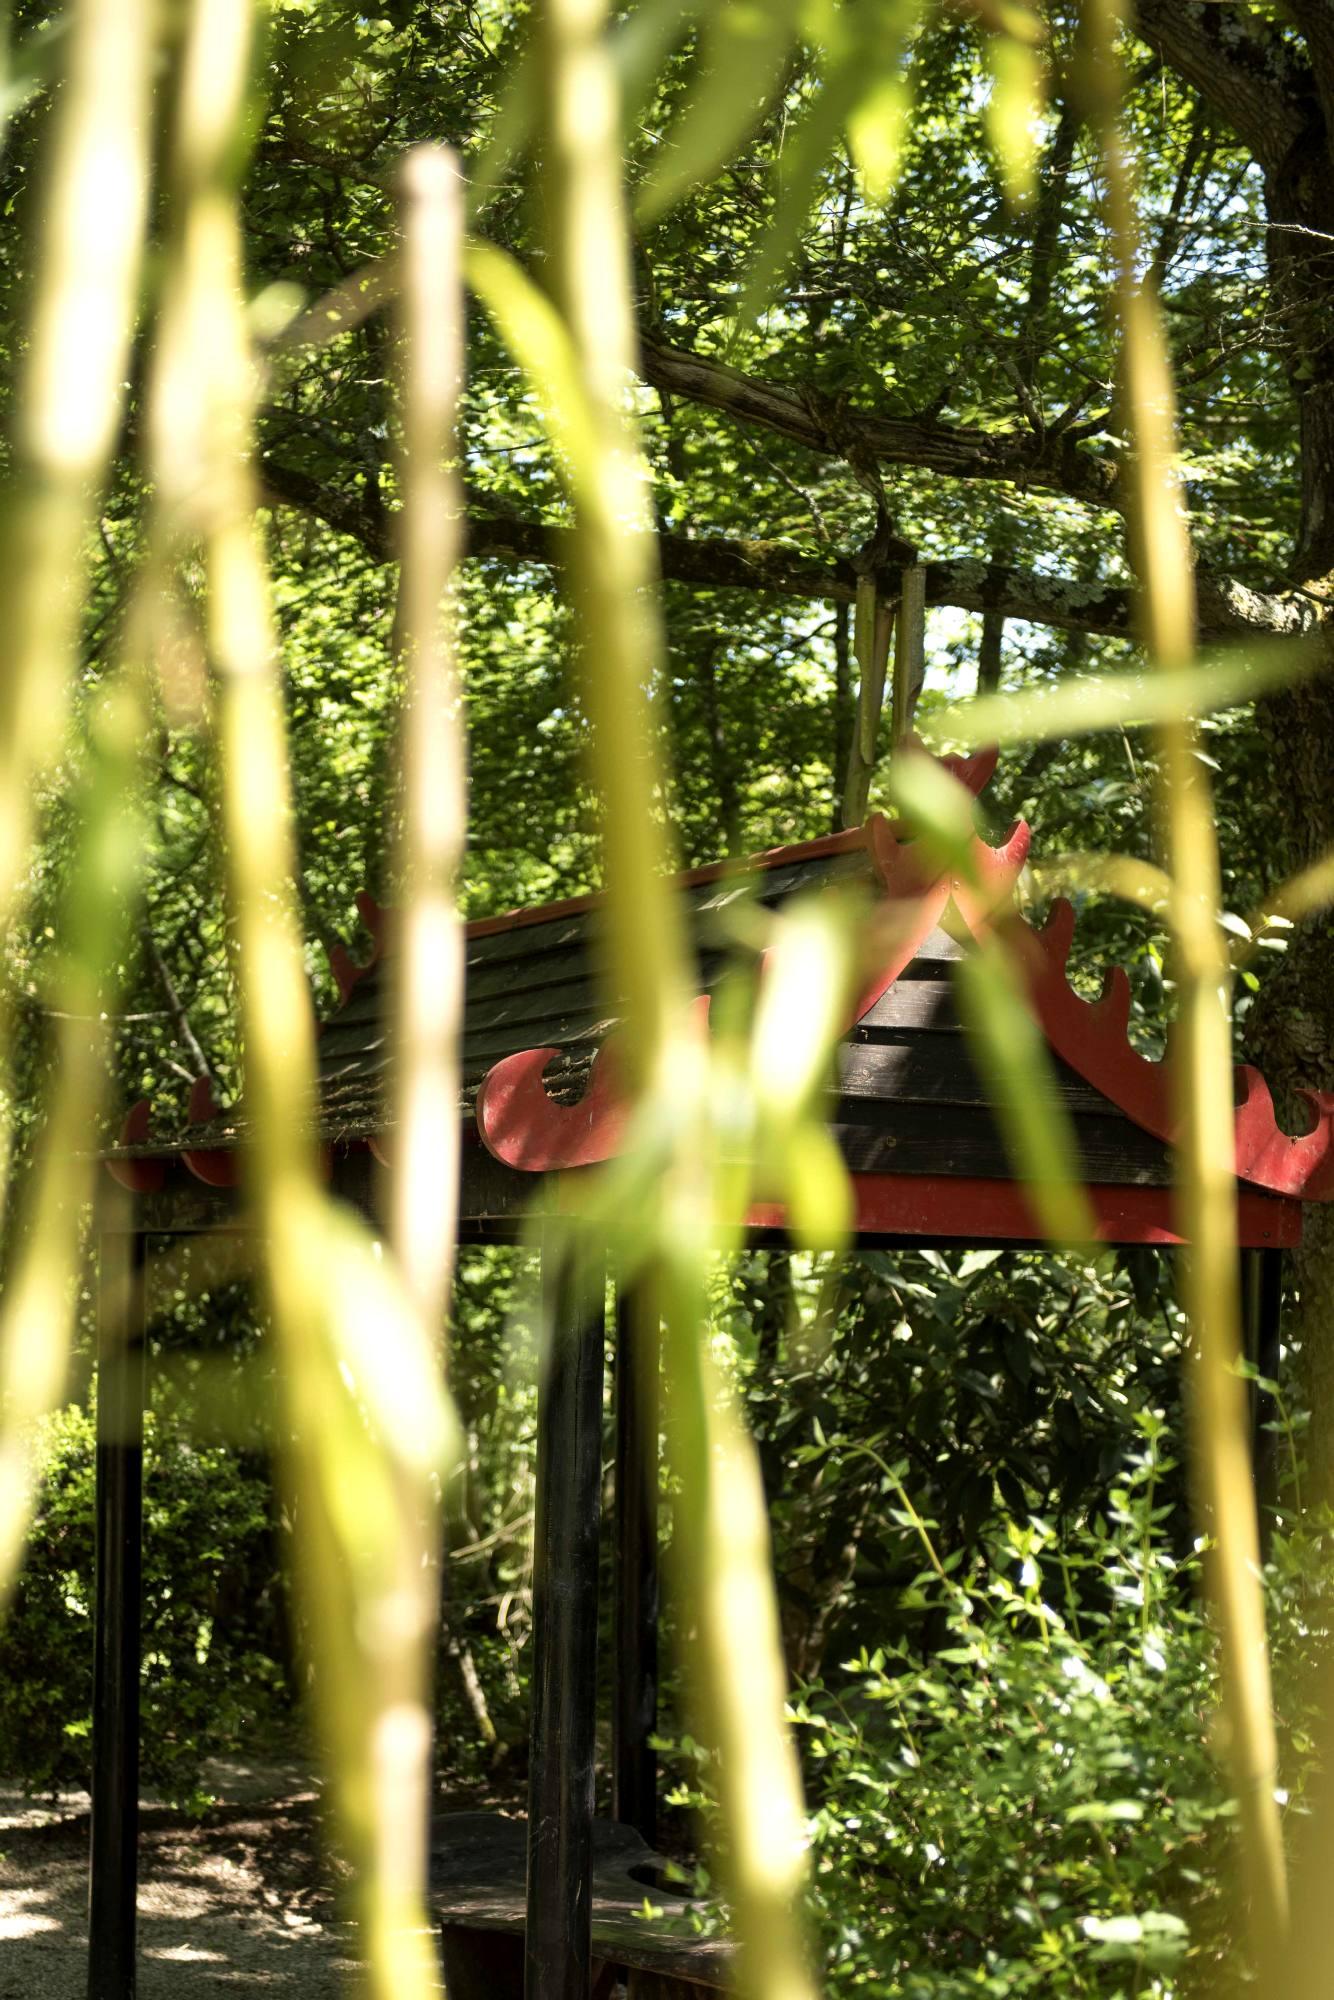 Jardin asiatique proche rennes 35 jardins de broc liande - Jardin asiatique ...